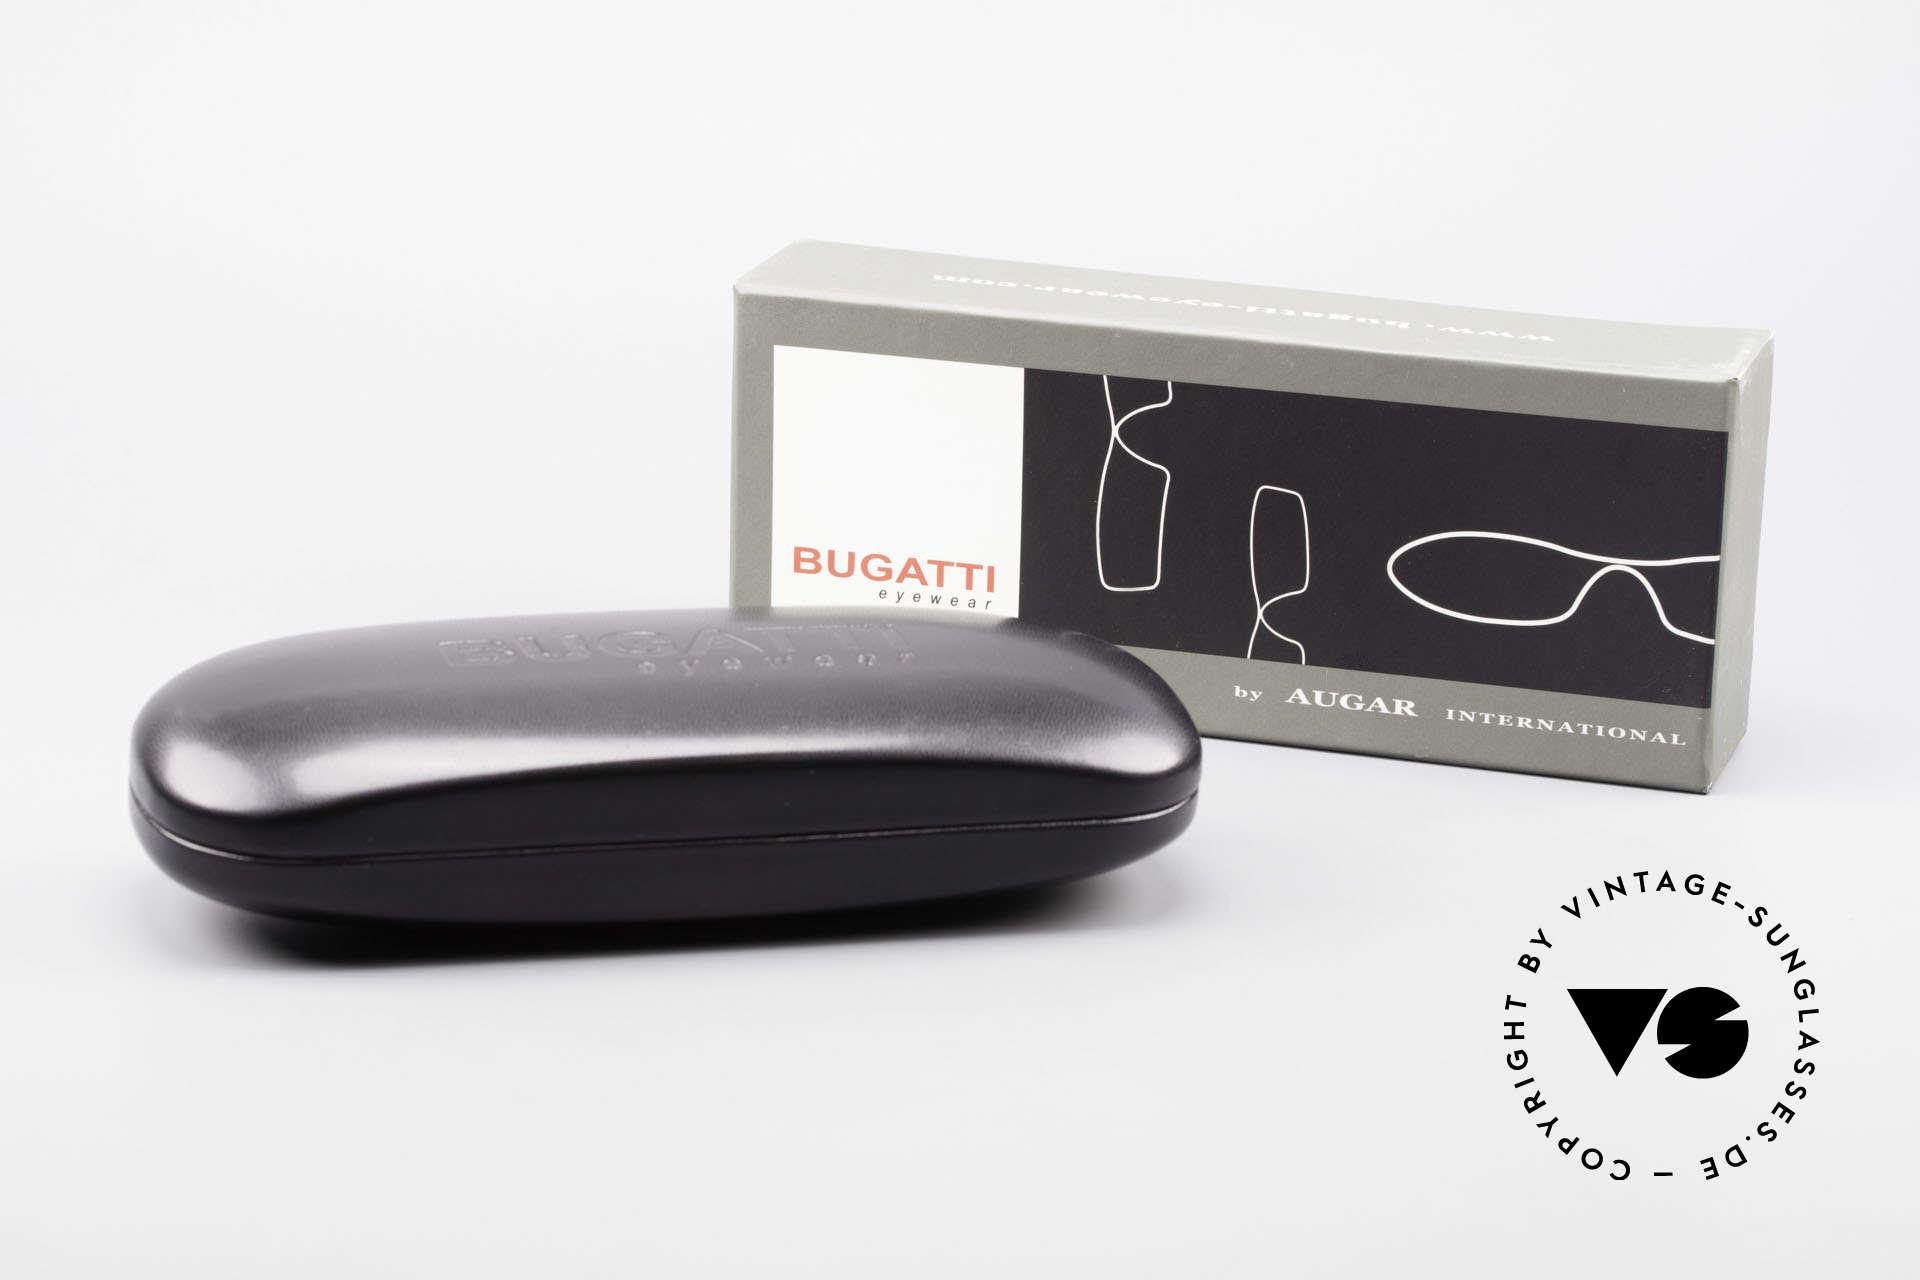 Bugatti 325 Odotype Rare Men's Designer Eyeglasses, Size: small, Made for Men